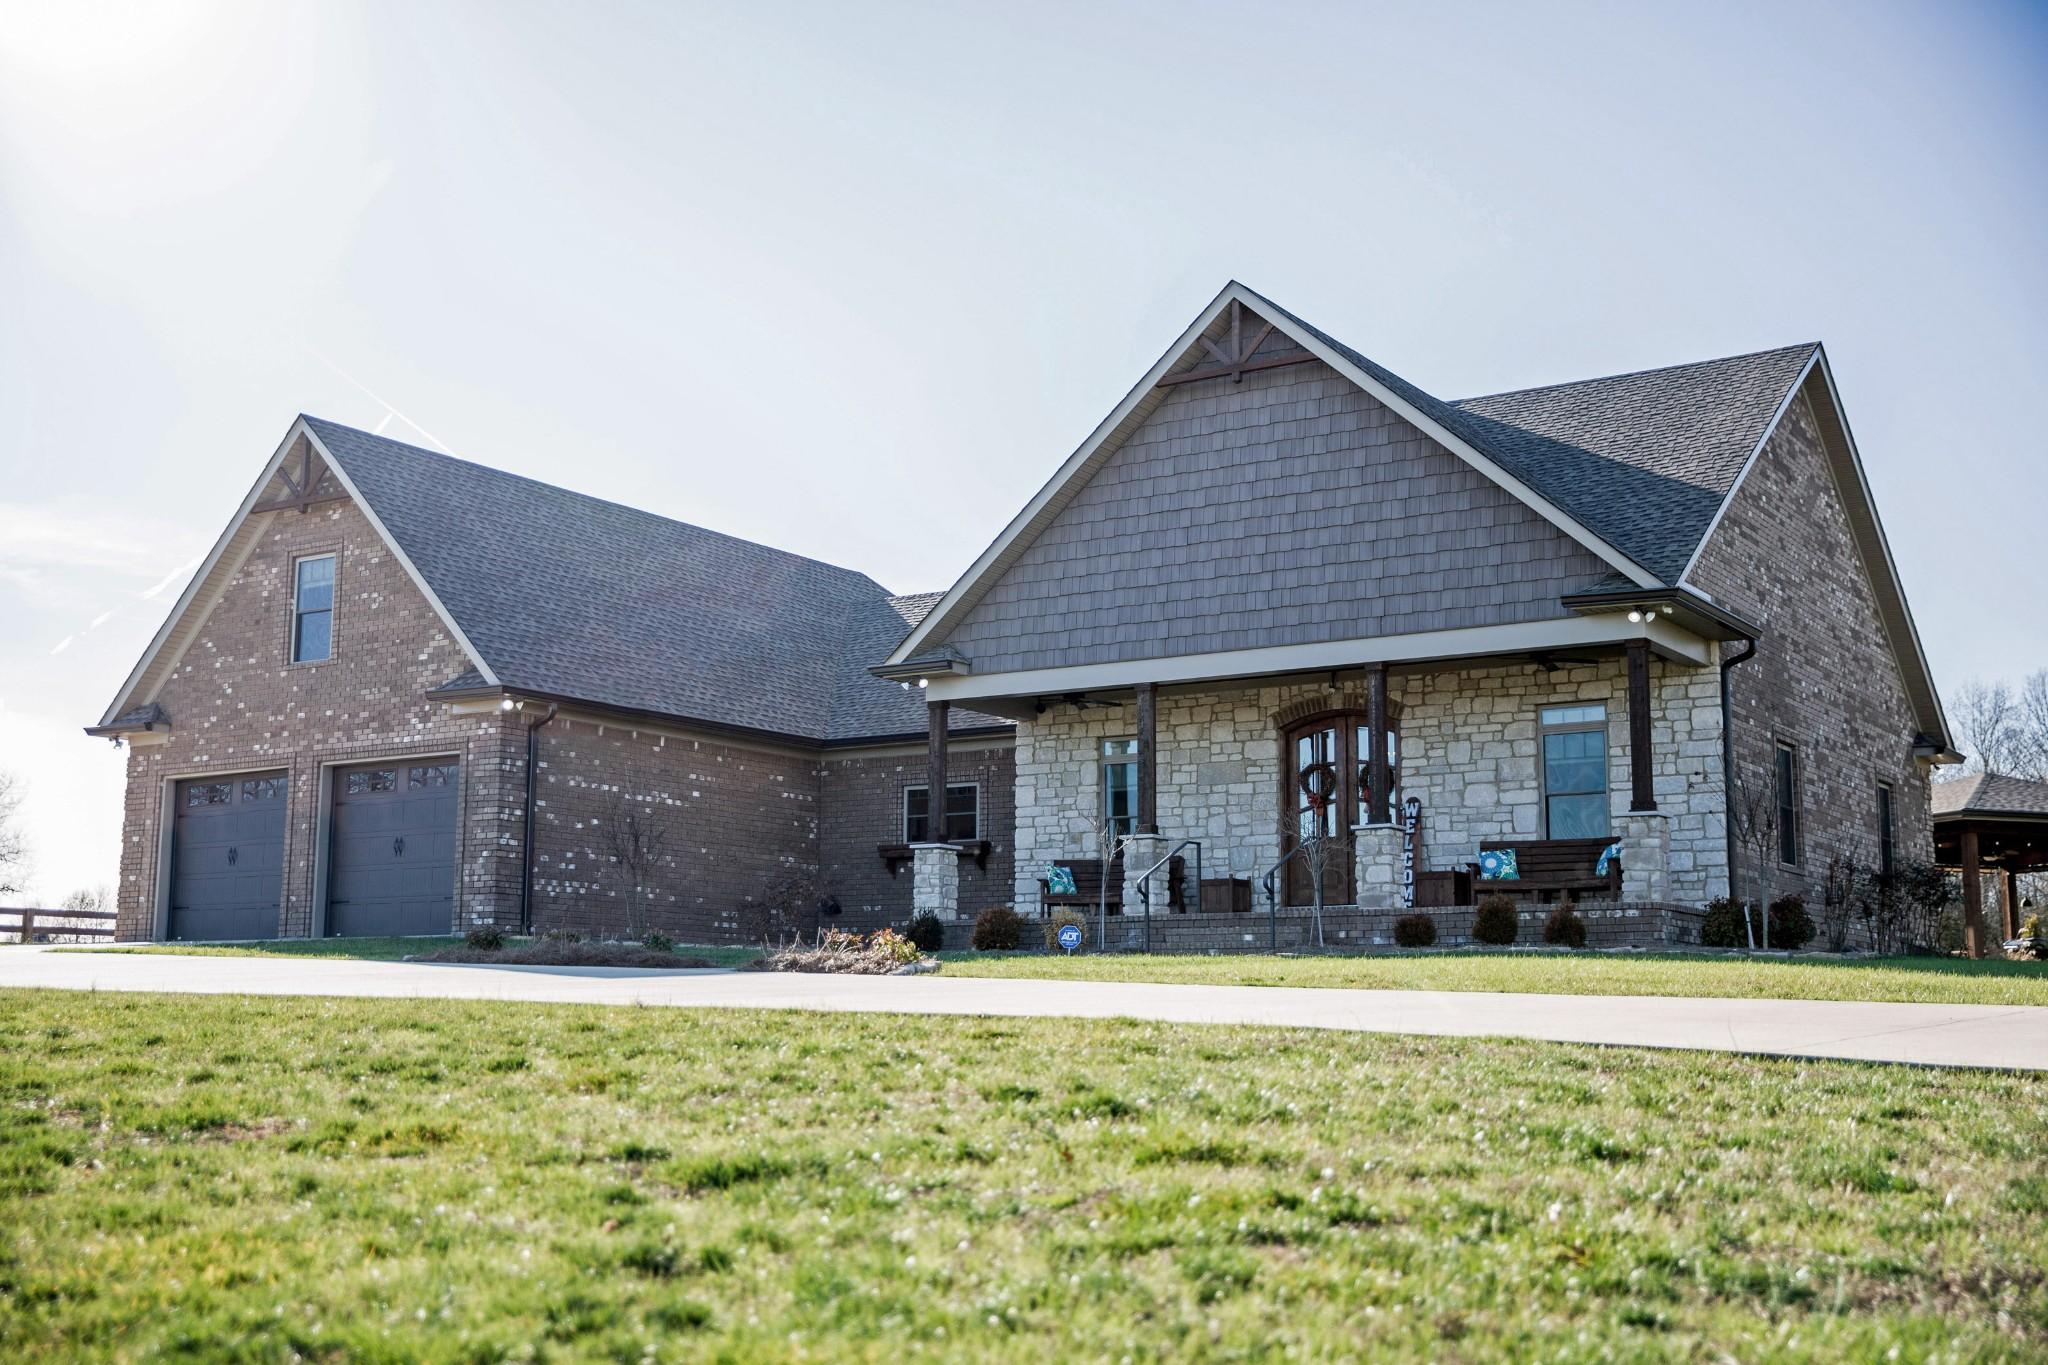 5601 Cave Spring Road, Auburn, KY 42206 - Auburn, KY real estate listing